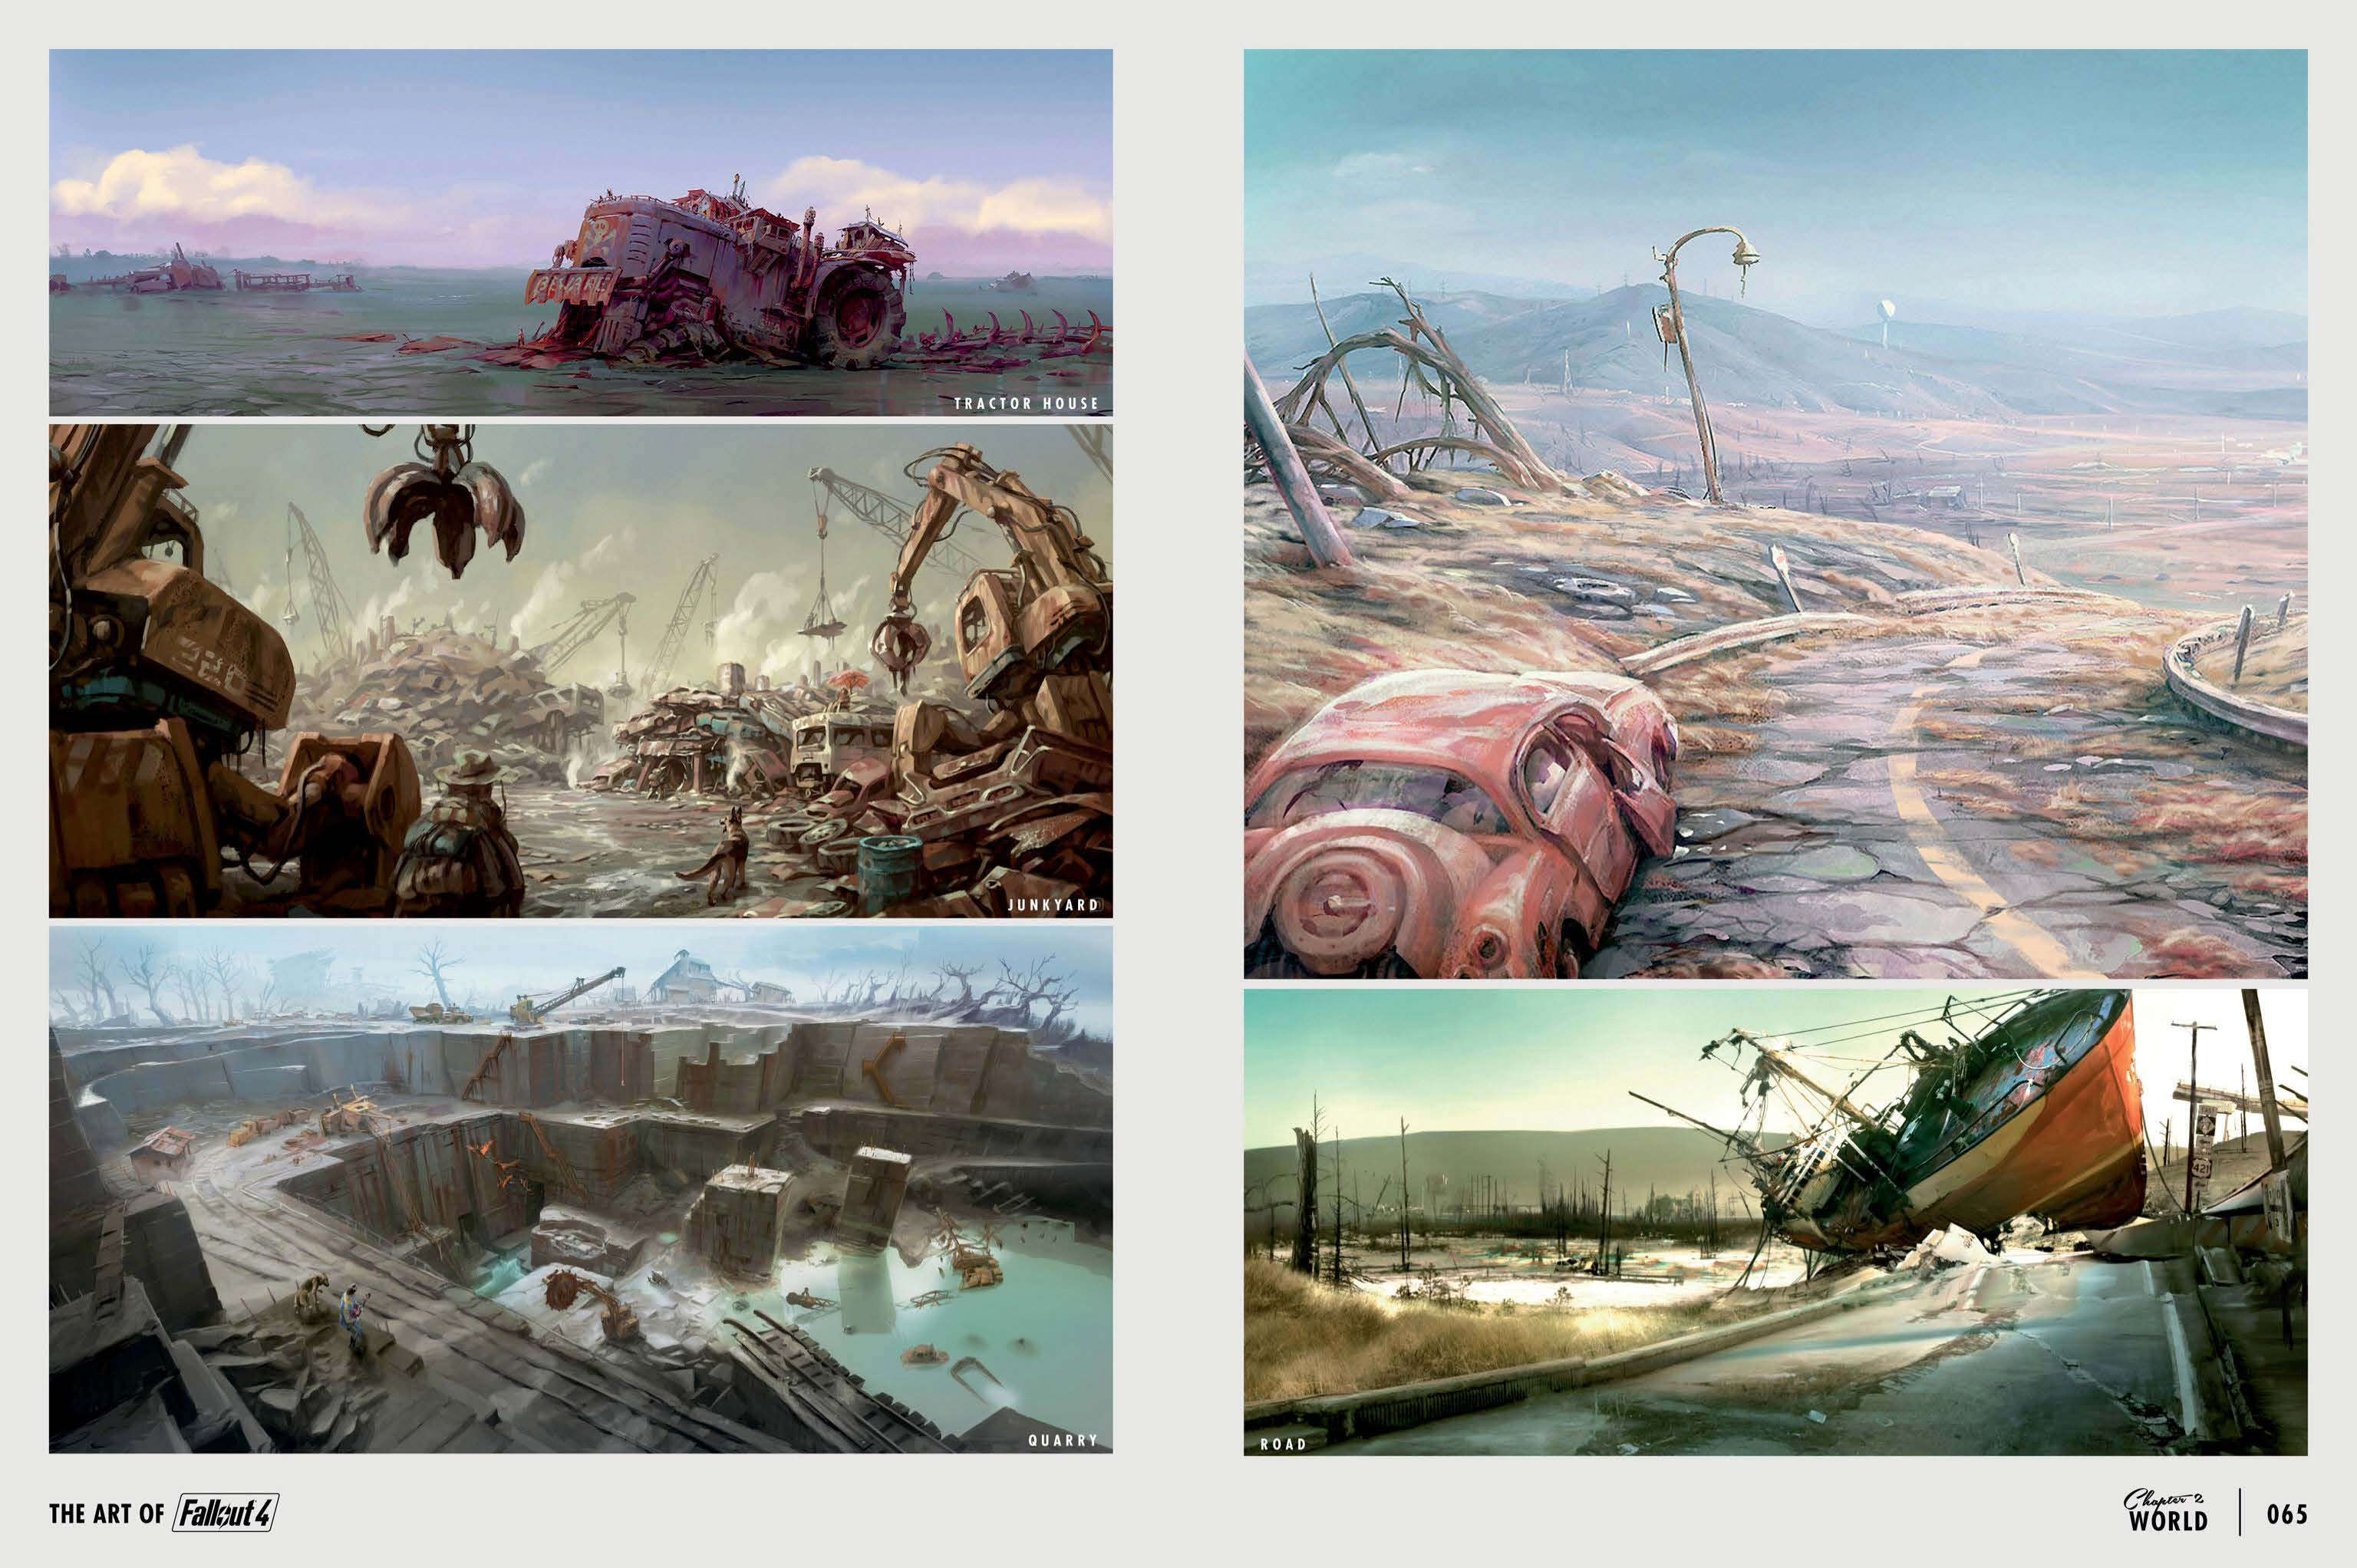 The Art of Fallout 4 - # 033 - Fallout 4 Артбук